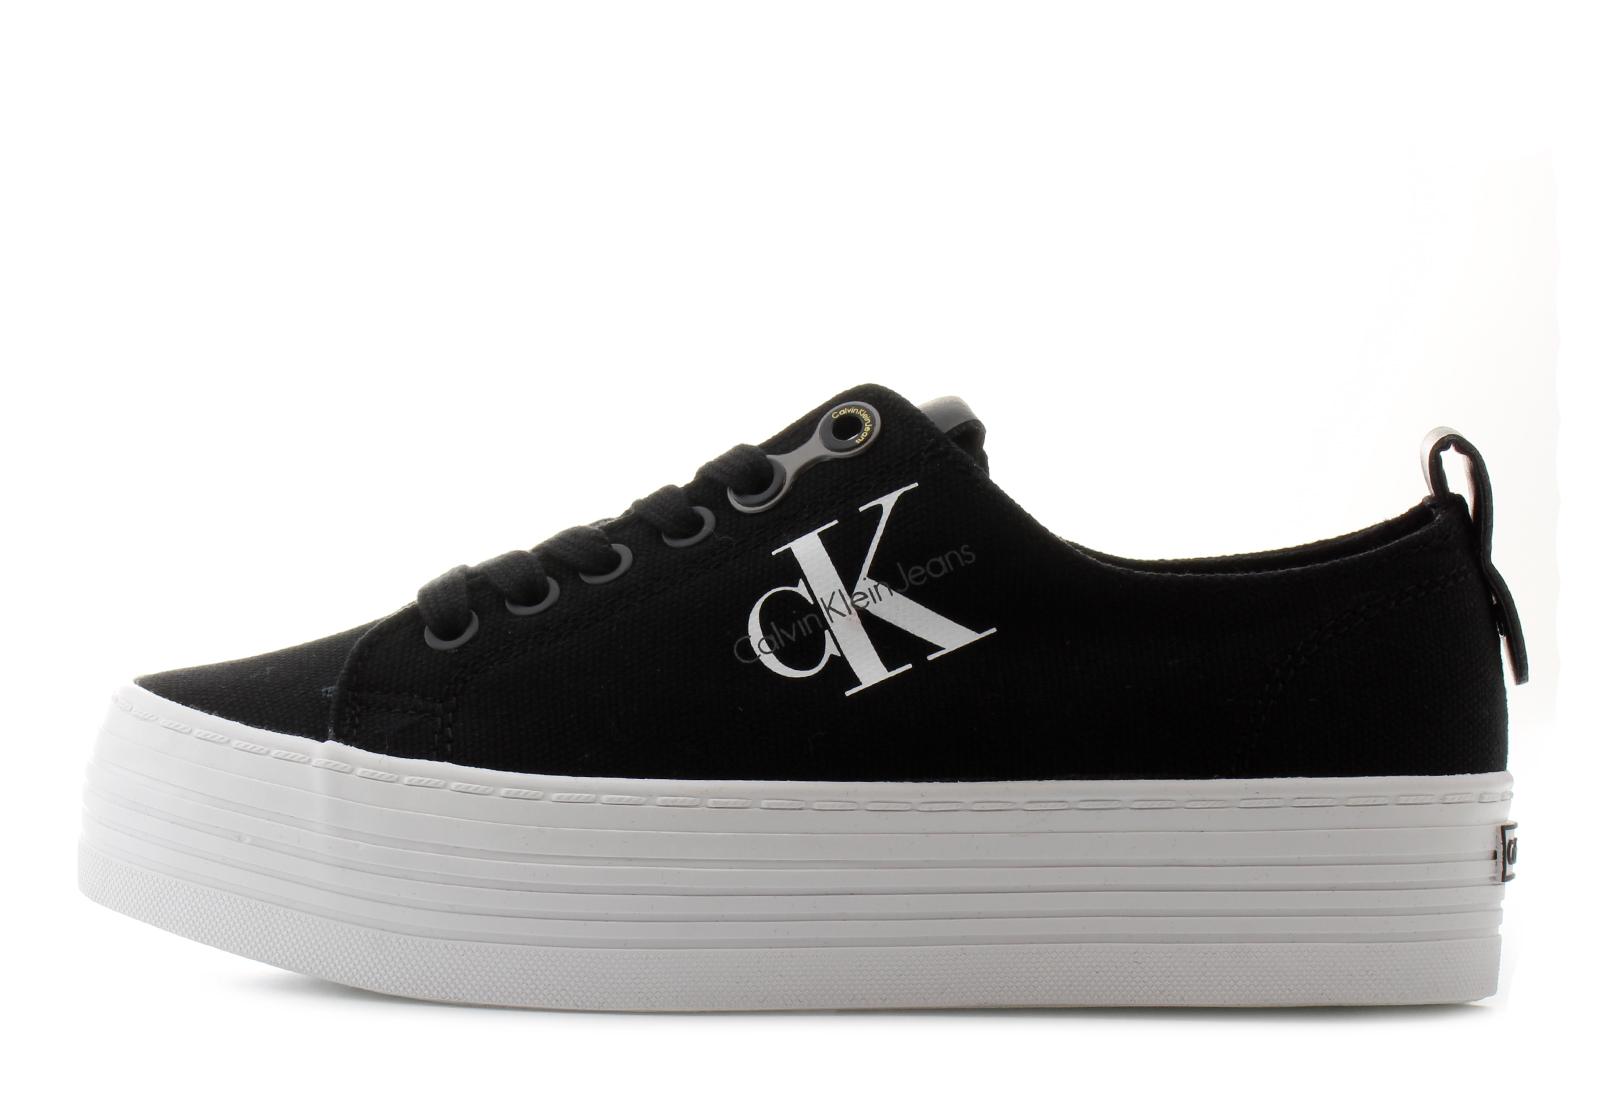 44a295c0d9 Calvin Klein Jeans Cipő - Zolah - R0673-BLK - Office Shoes Magyarország